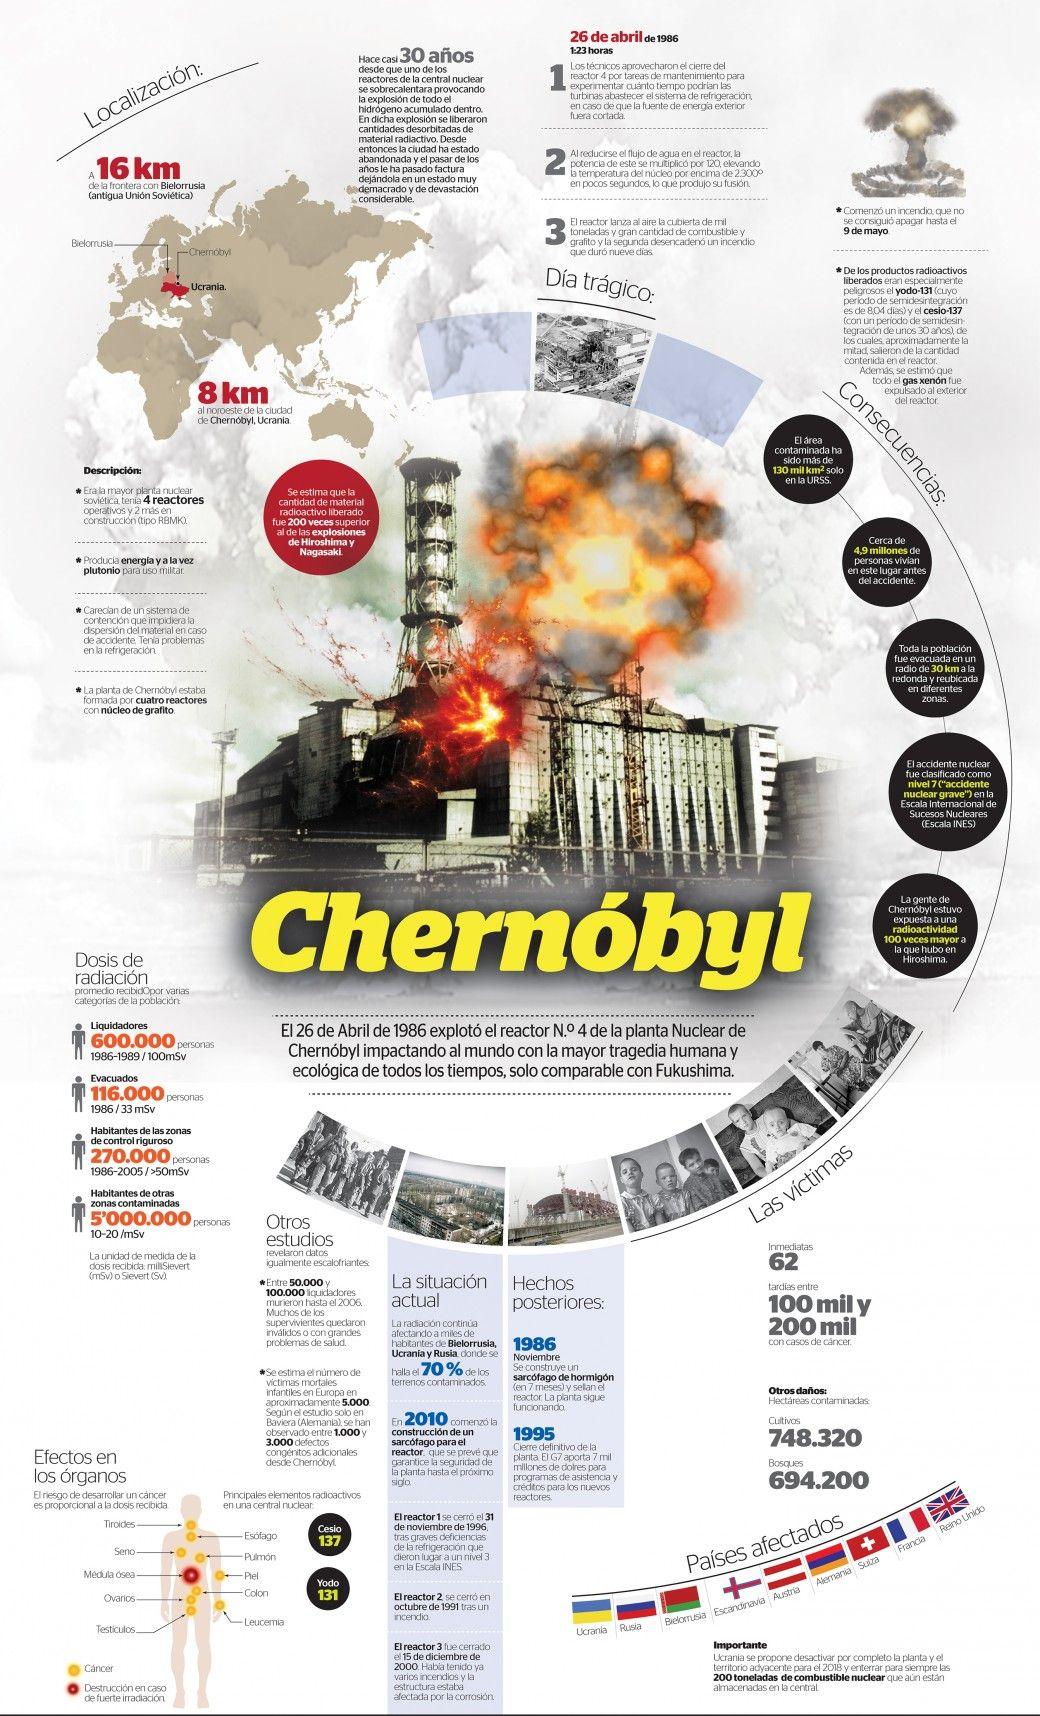 Radioecology clipart svg freeuse download Chernobyl   importante   Infografia diseño, Disenos de unas ... svg freeuse download